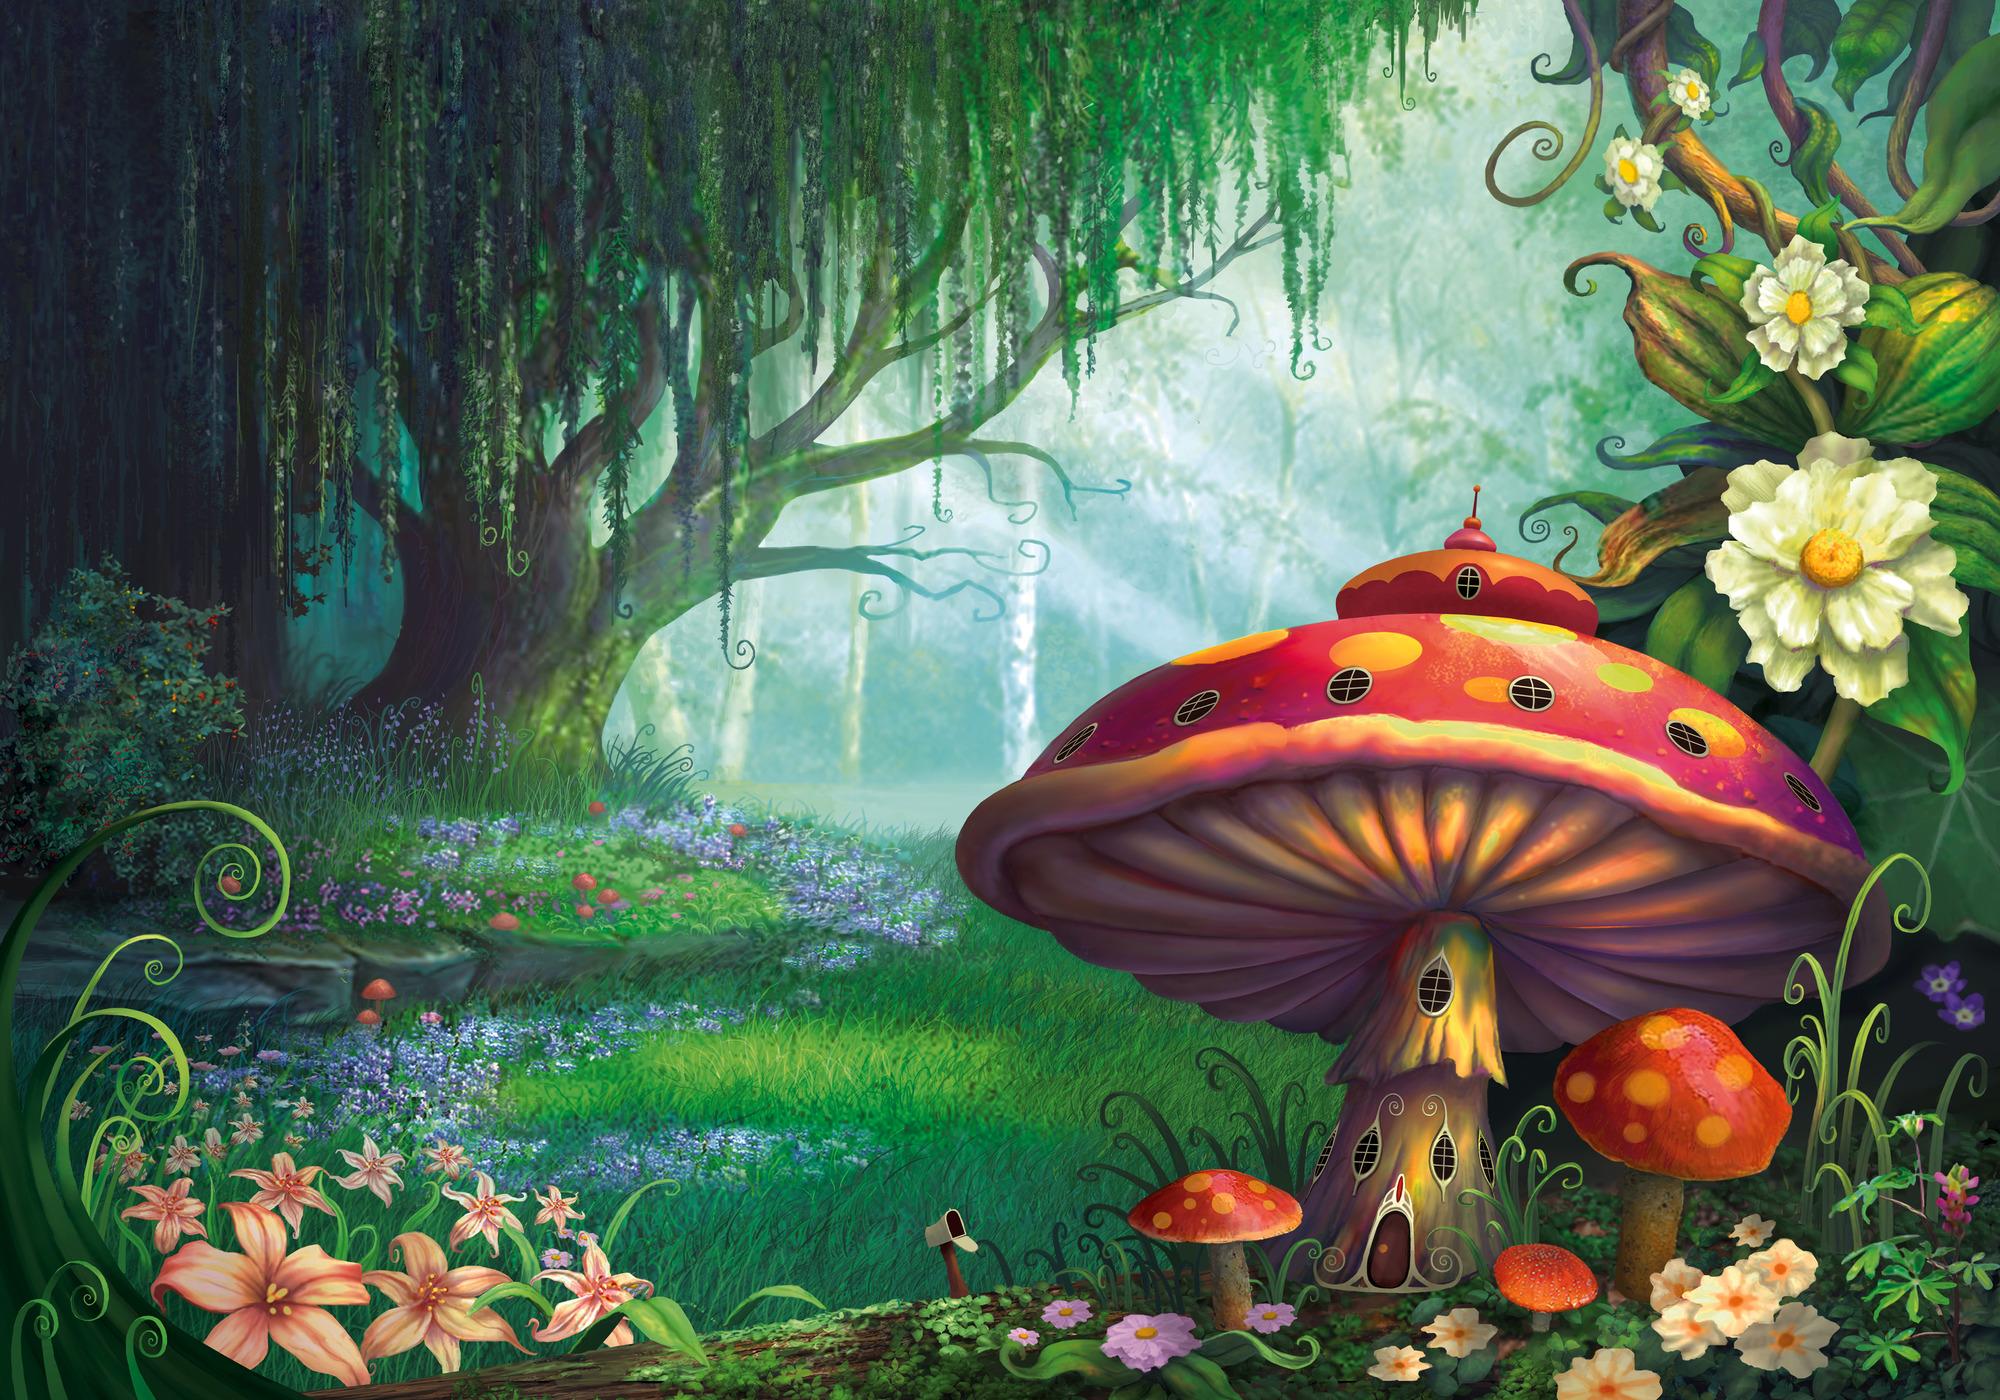 Artistic Fantasy Flower Forest House Mushroom Spring Tree 2000x1400